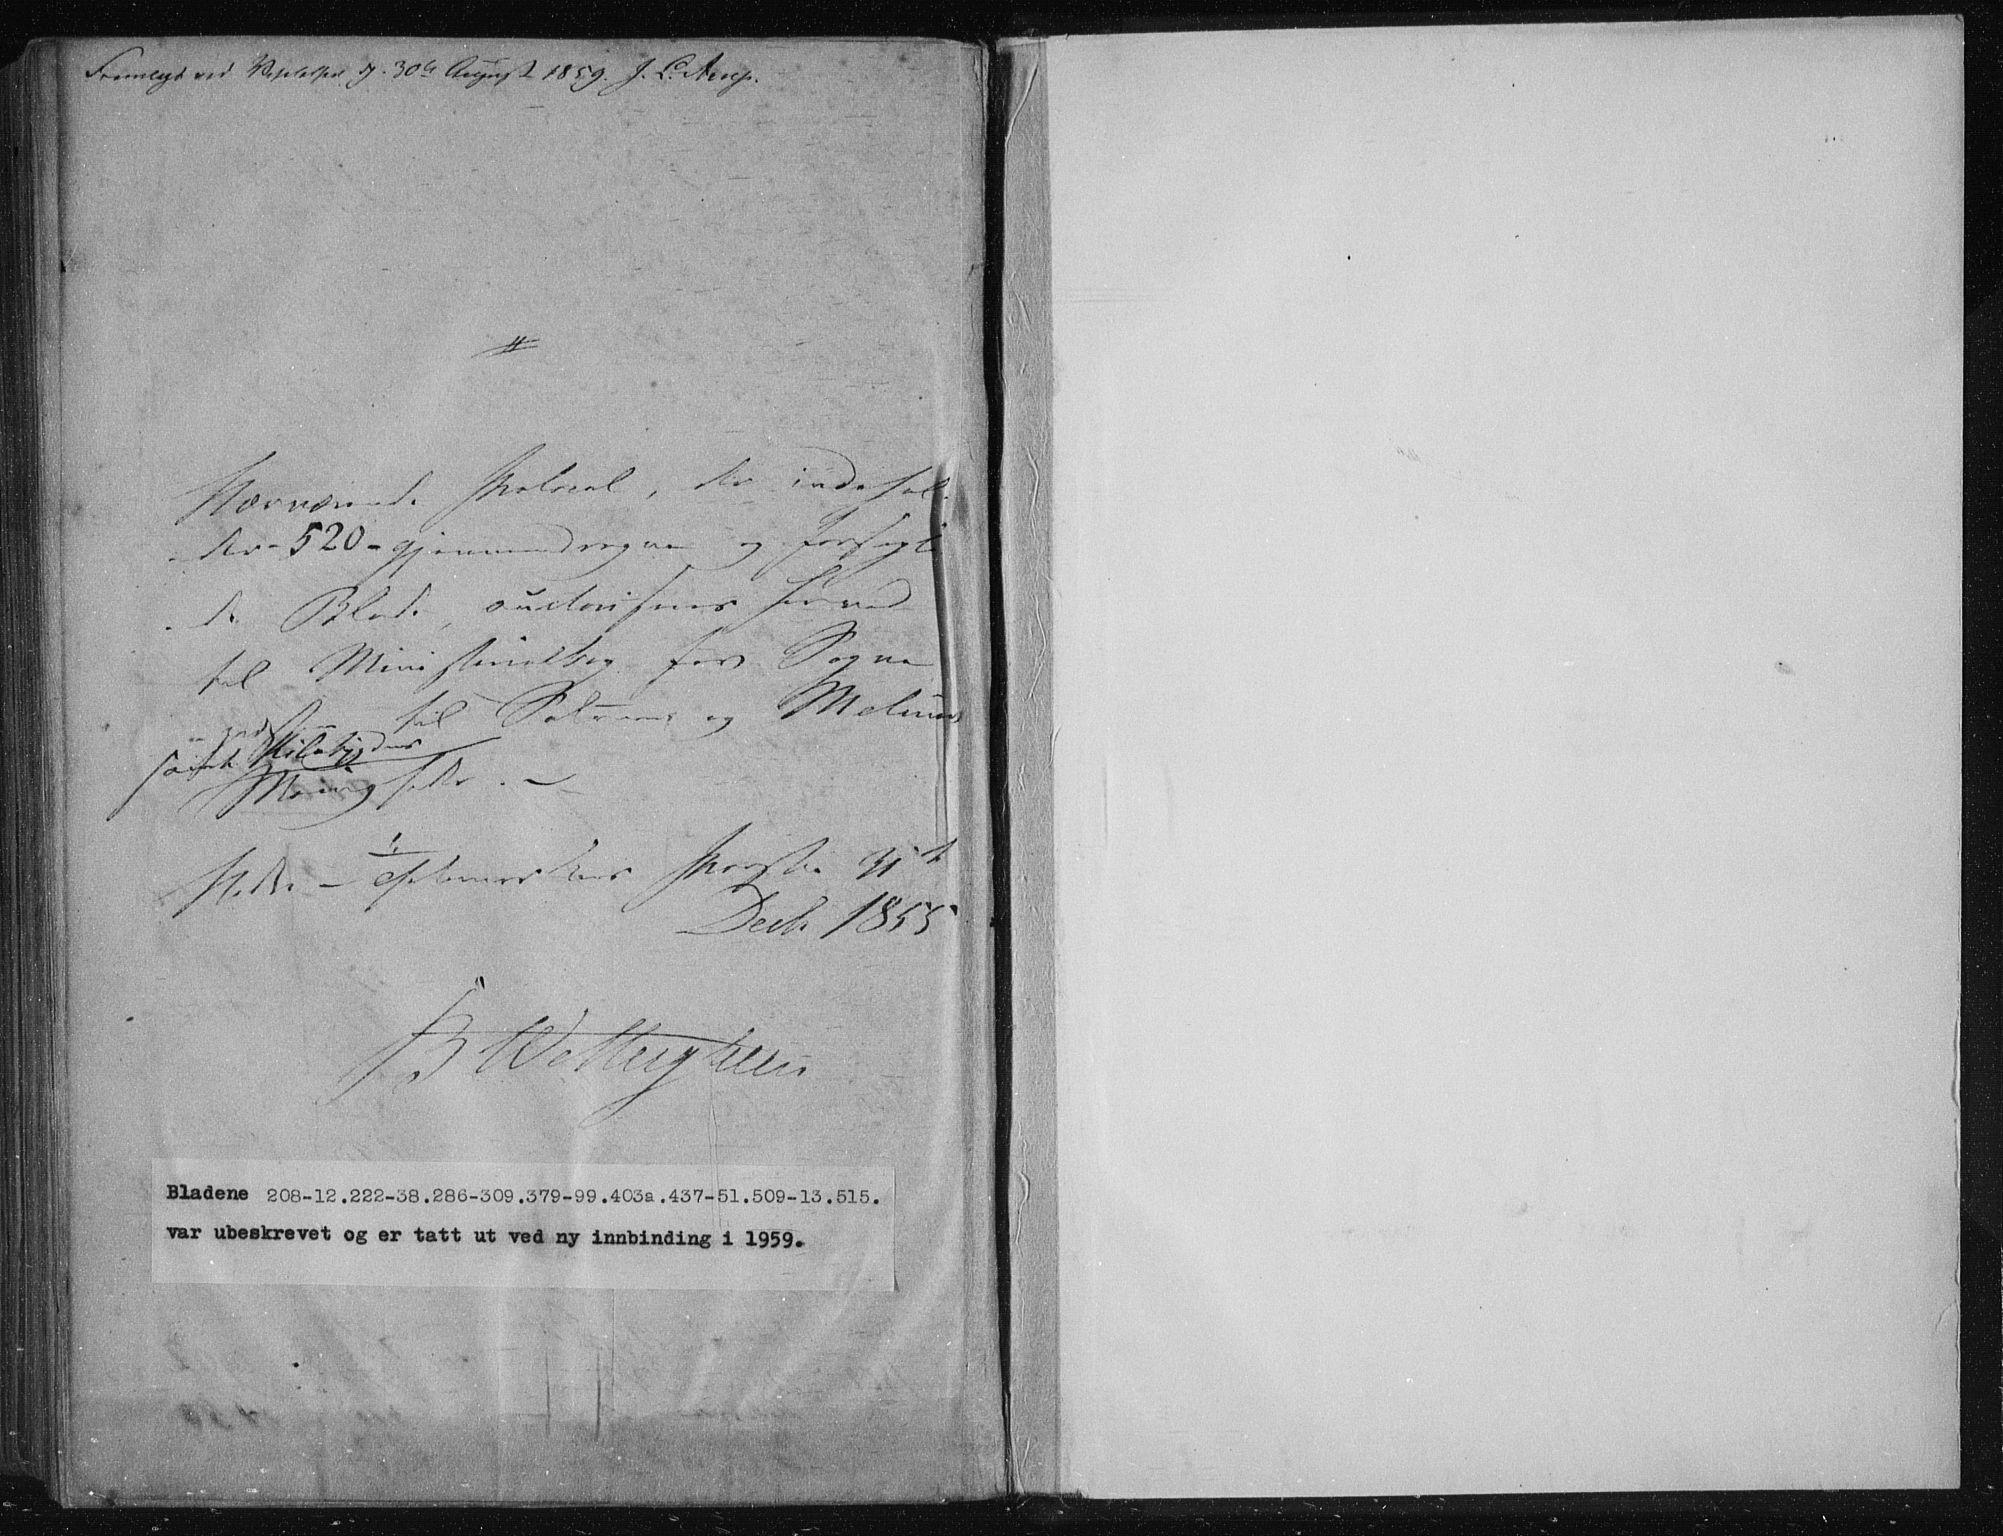 SAKO, Solum kirkebøker, F/Fa/L0007: Ministerialbok nr. I 7, 1856-1864